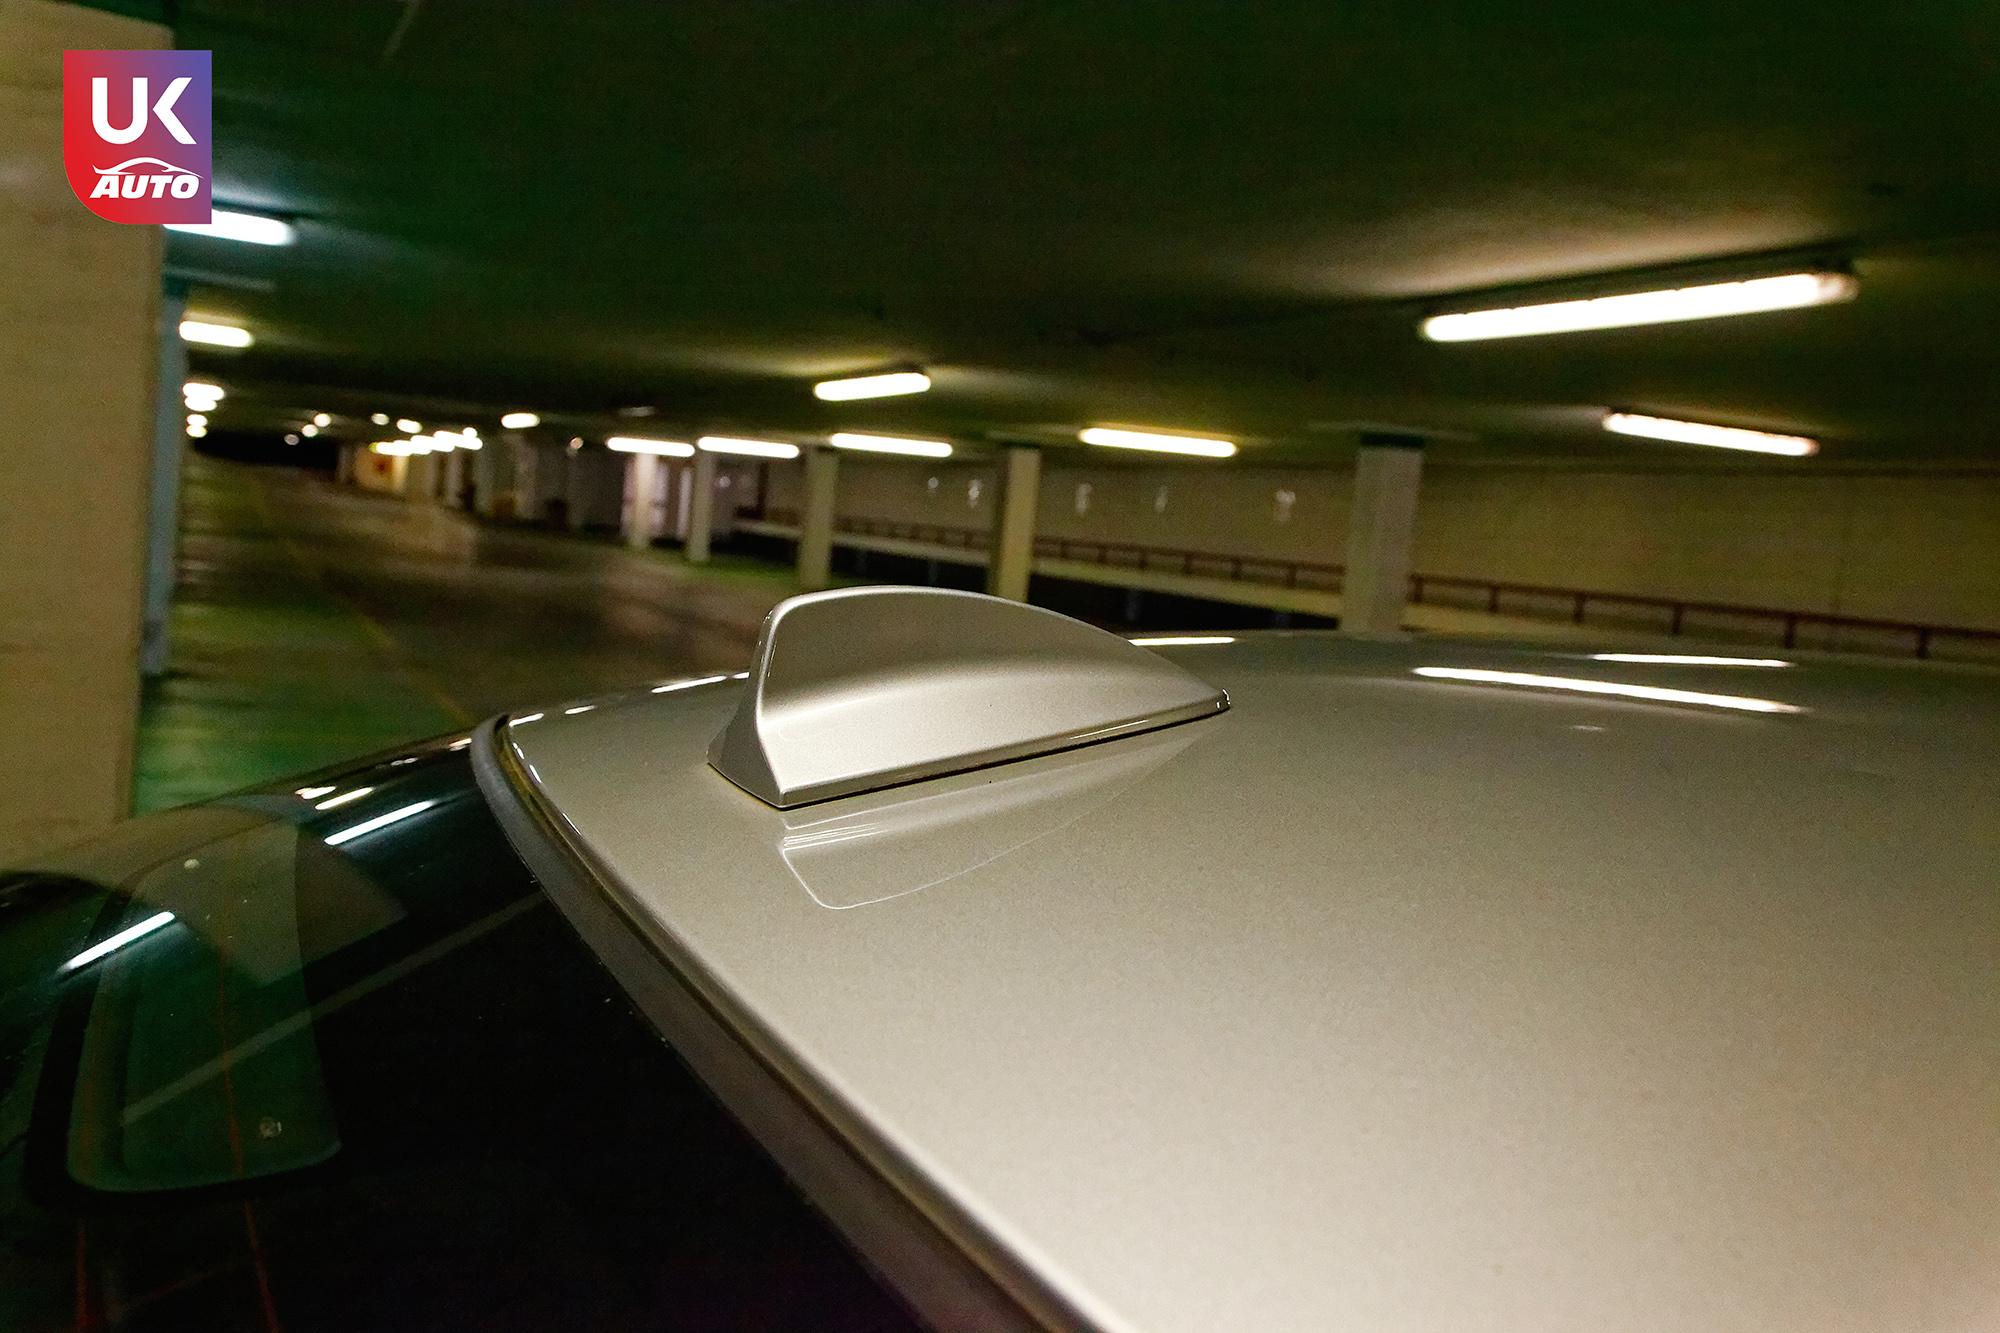 Bmw 335i rhd import uk bmw occasion bmw mandataire e92 rhd coupe uk auto uk ukauto7 - Felecitation a Julien pour cette BMW 335i E92 COUPE RHD importateur voitures anglaises